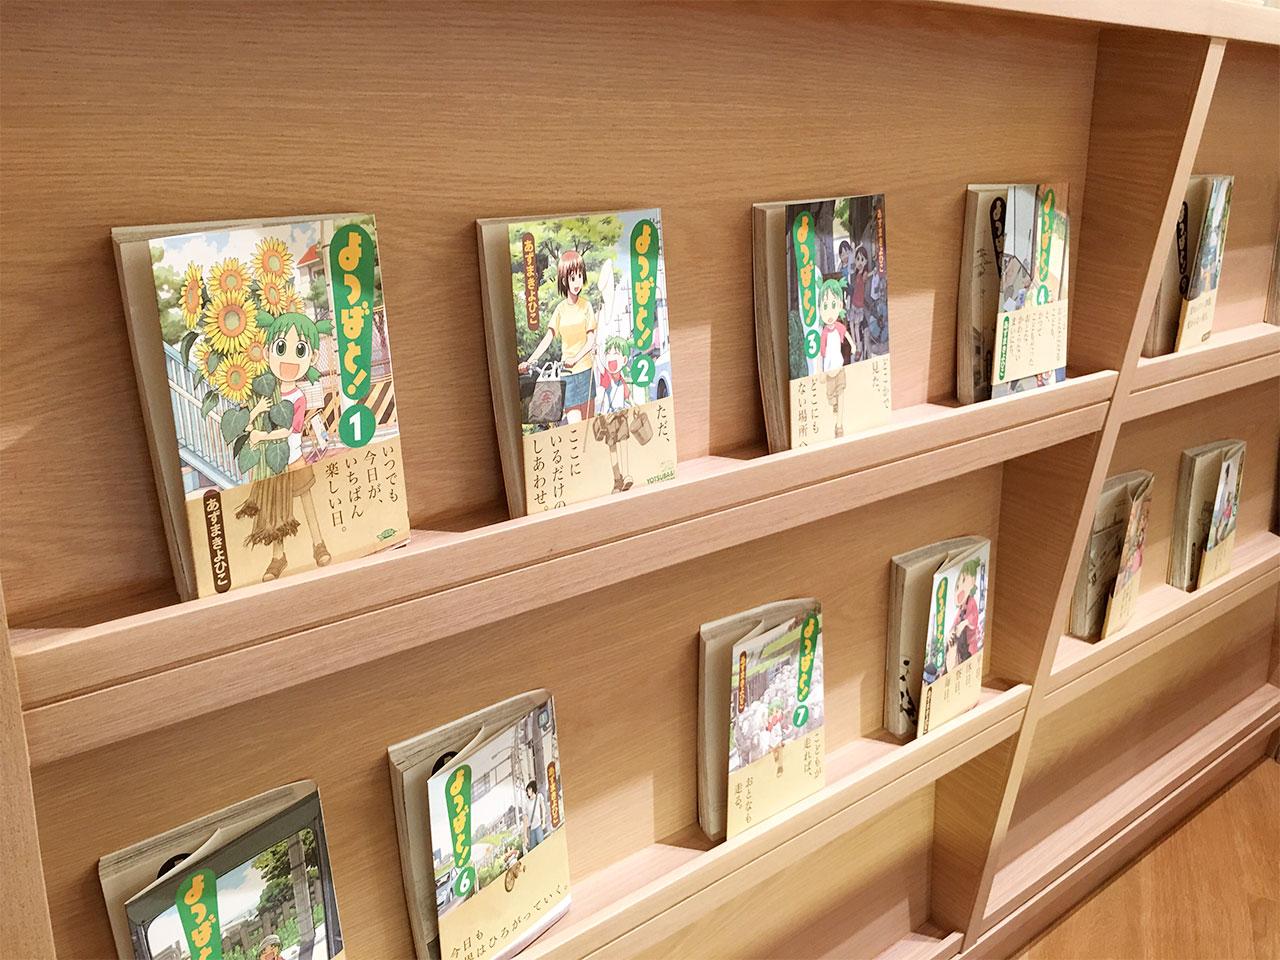 tachikawa-danboard-cafe-comics